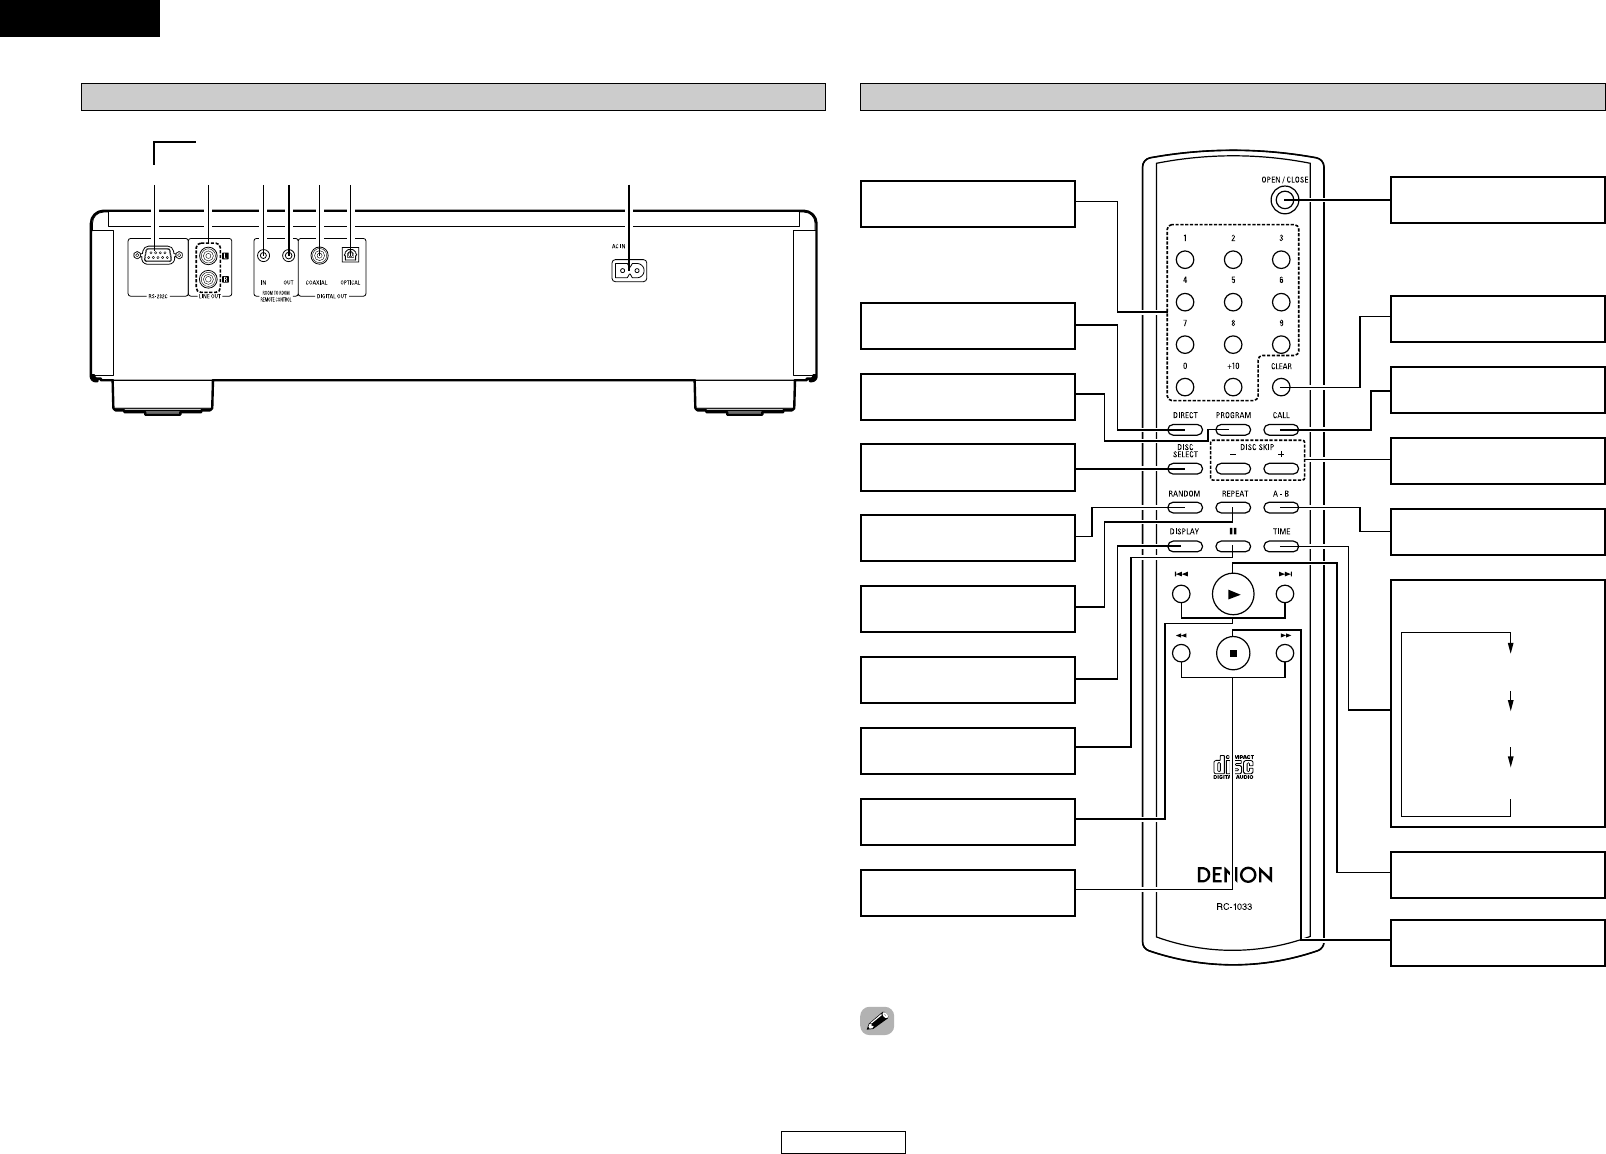 Denon DCM-290 q er t u, yw